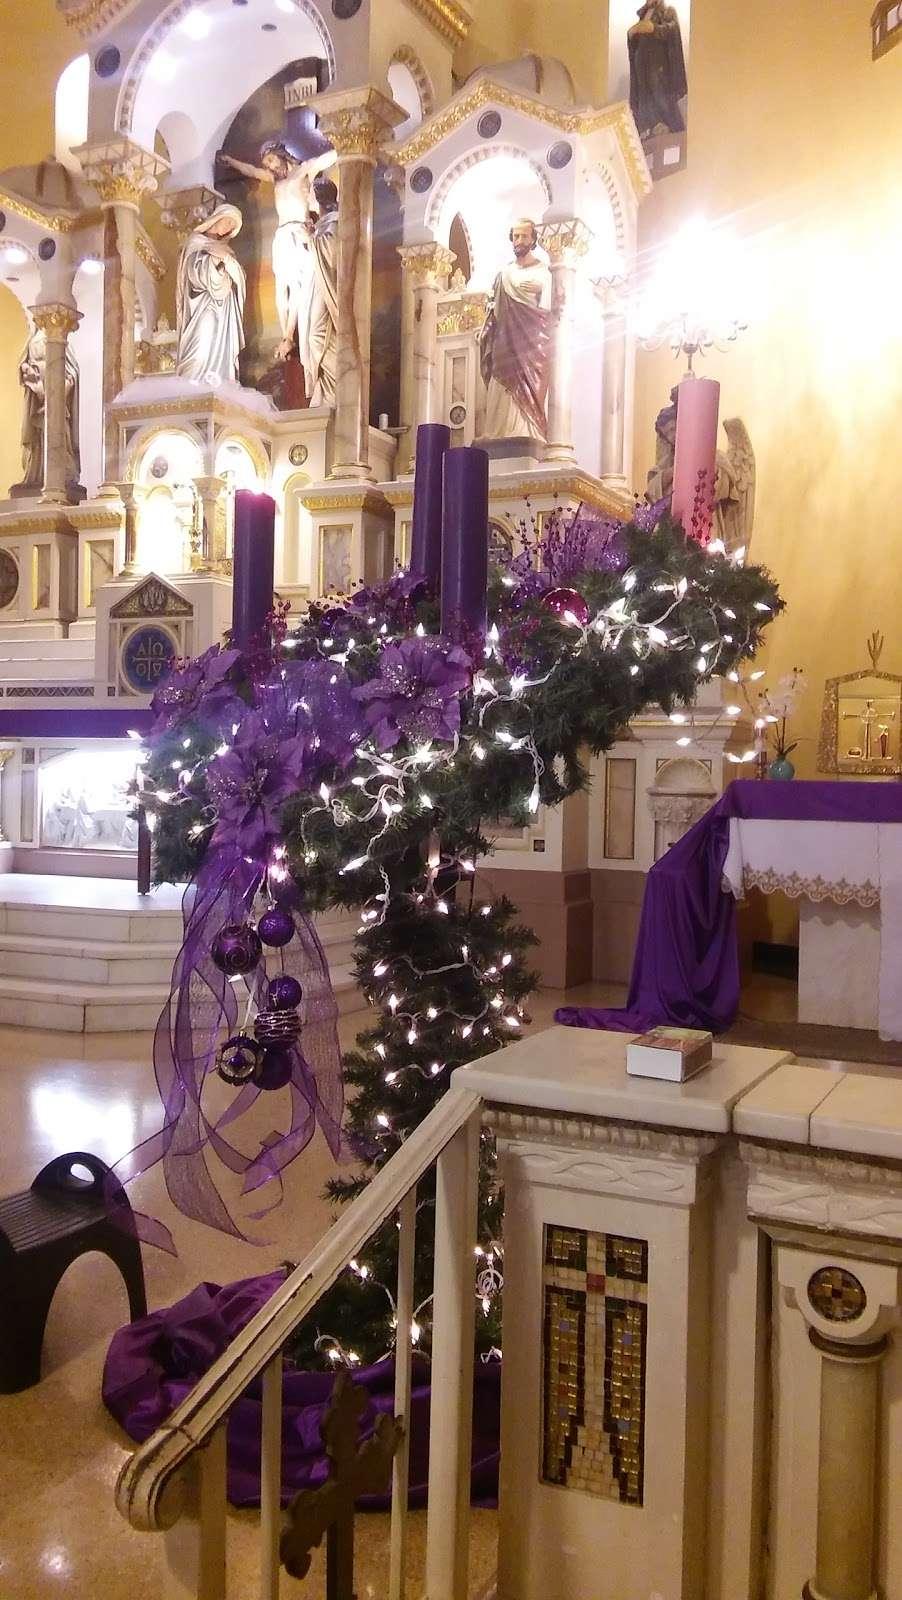 St Anthonys Catholic Church Parish Office - church    Photo 9 of 10   Address: 1510 S 49th Ct, Cicero, IL 60804, USA   Phone: (708) 652-0231